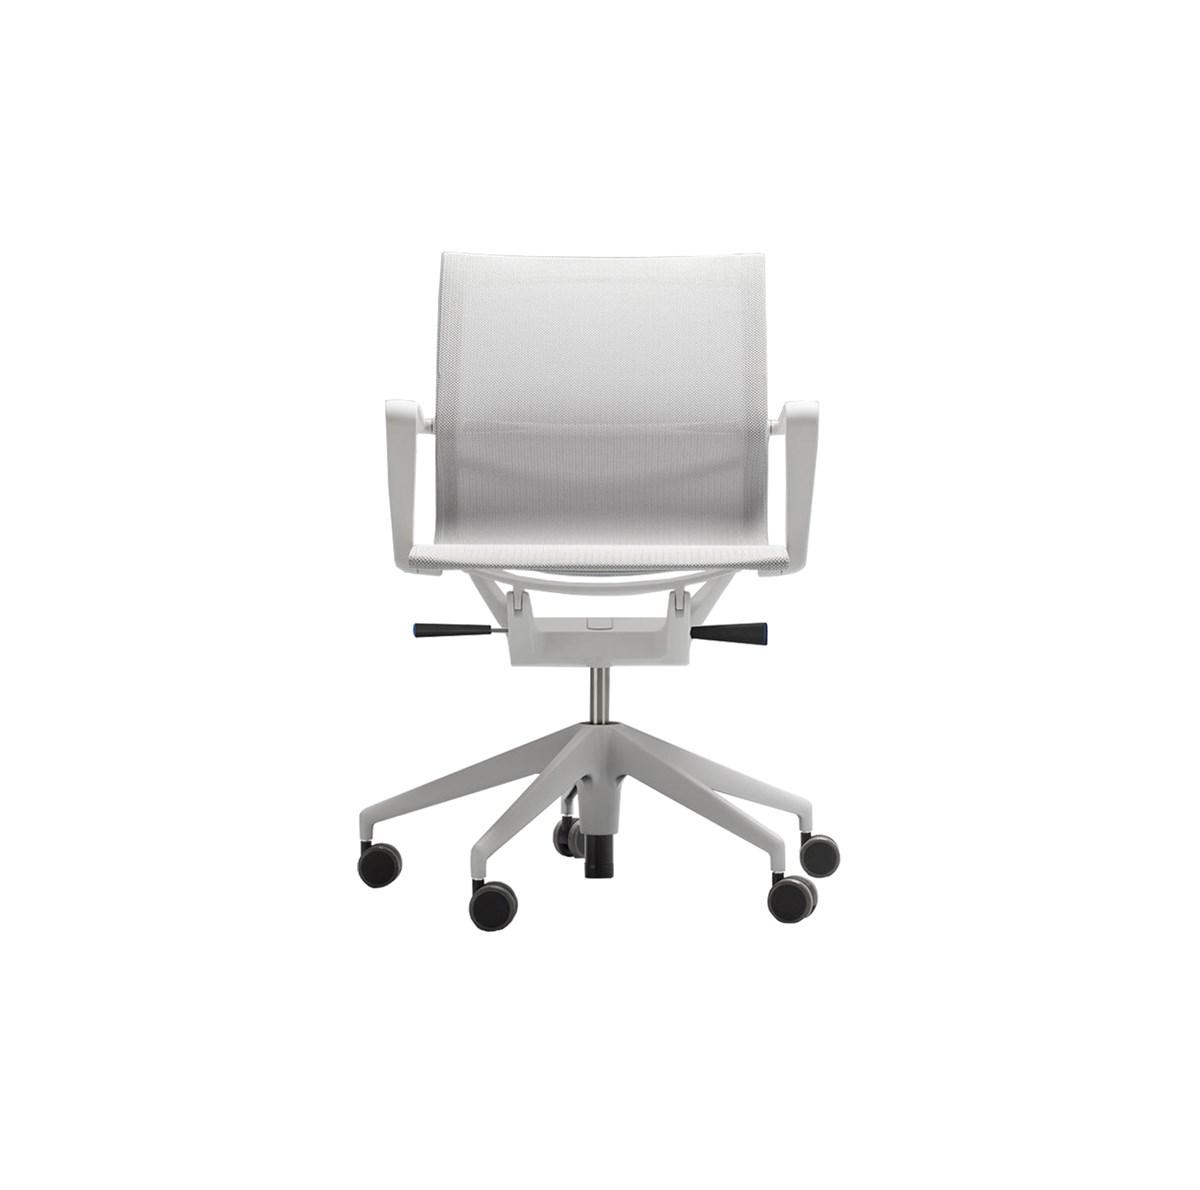 Vitra-Alberto-Meda-Physix-Chair-Matisse-1